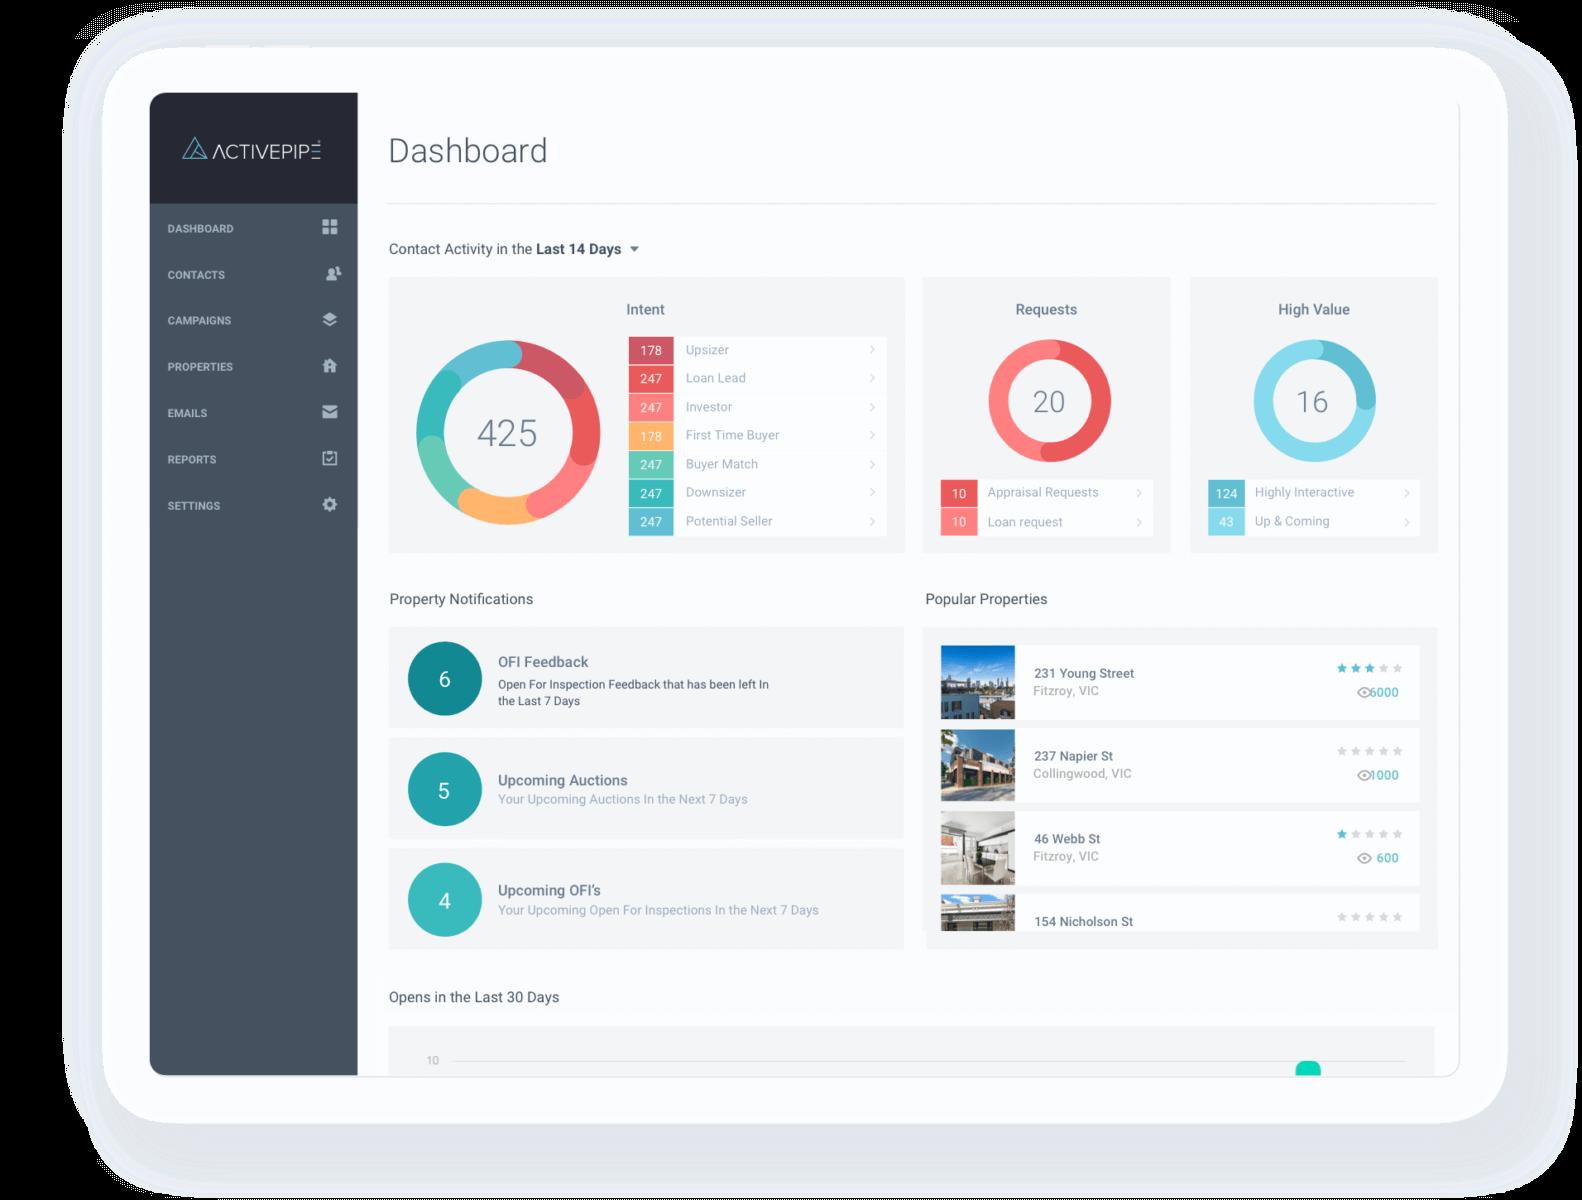 ActivePipe dashboard, activepipe.com